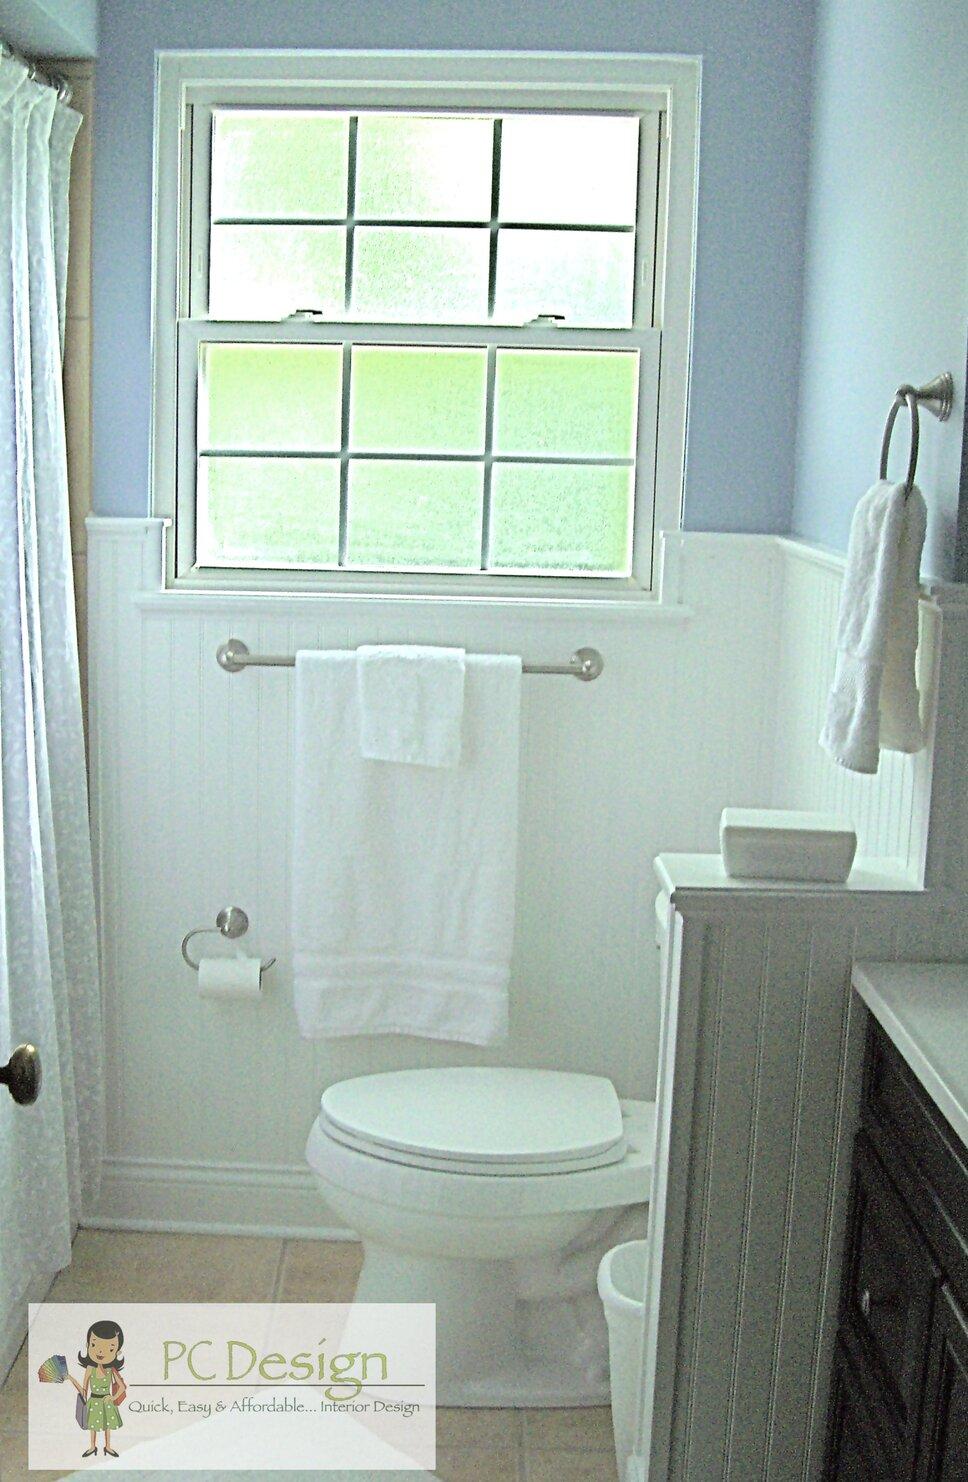 PC Design Inc. - Paige K. Castellini Contemporary Bathroom design